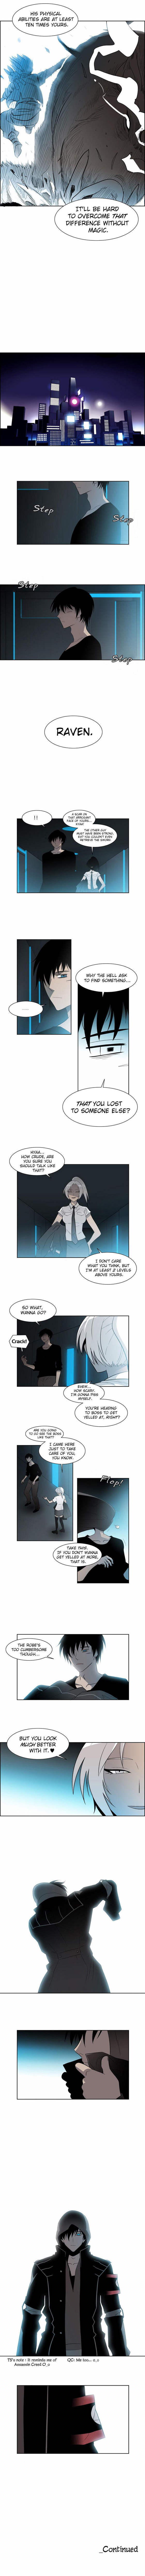 City of Dead Sorcerer 41 Page 1